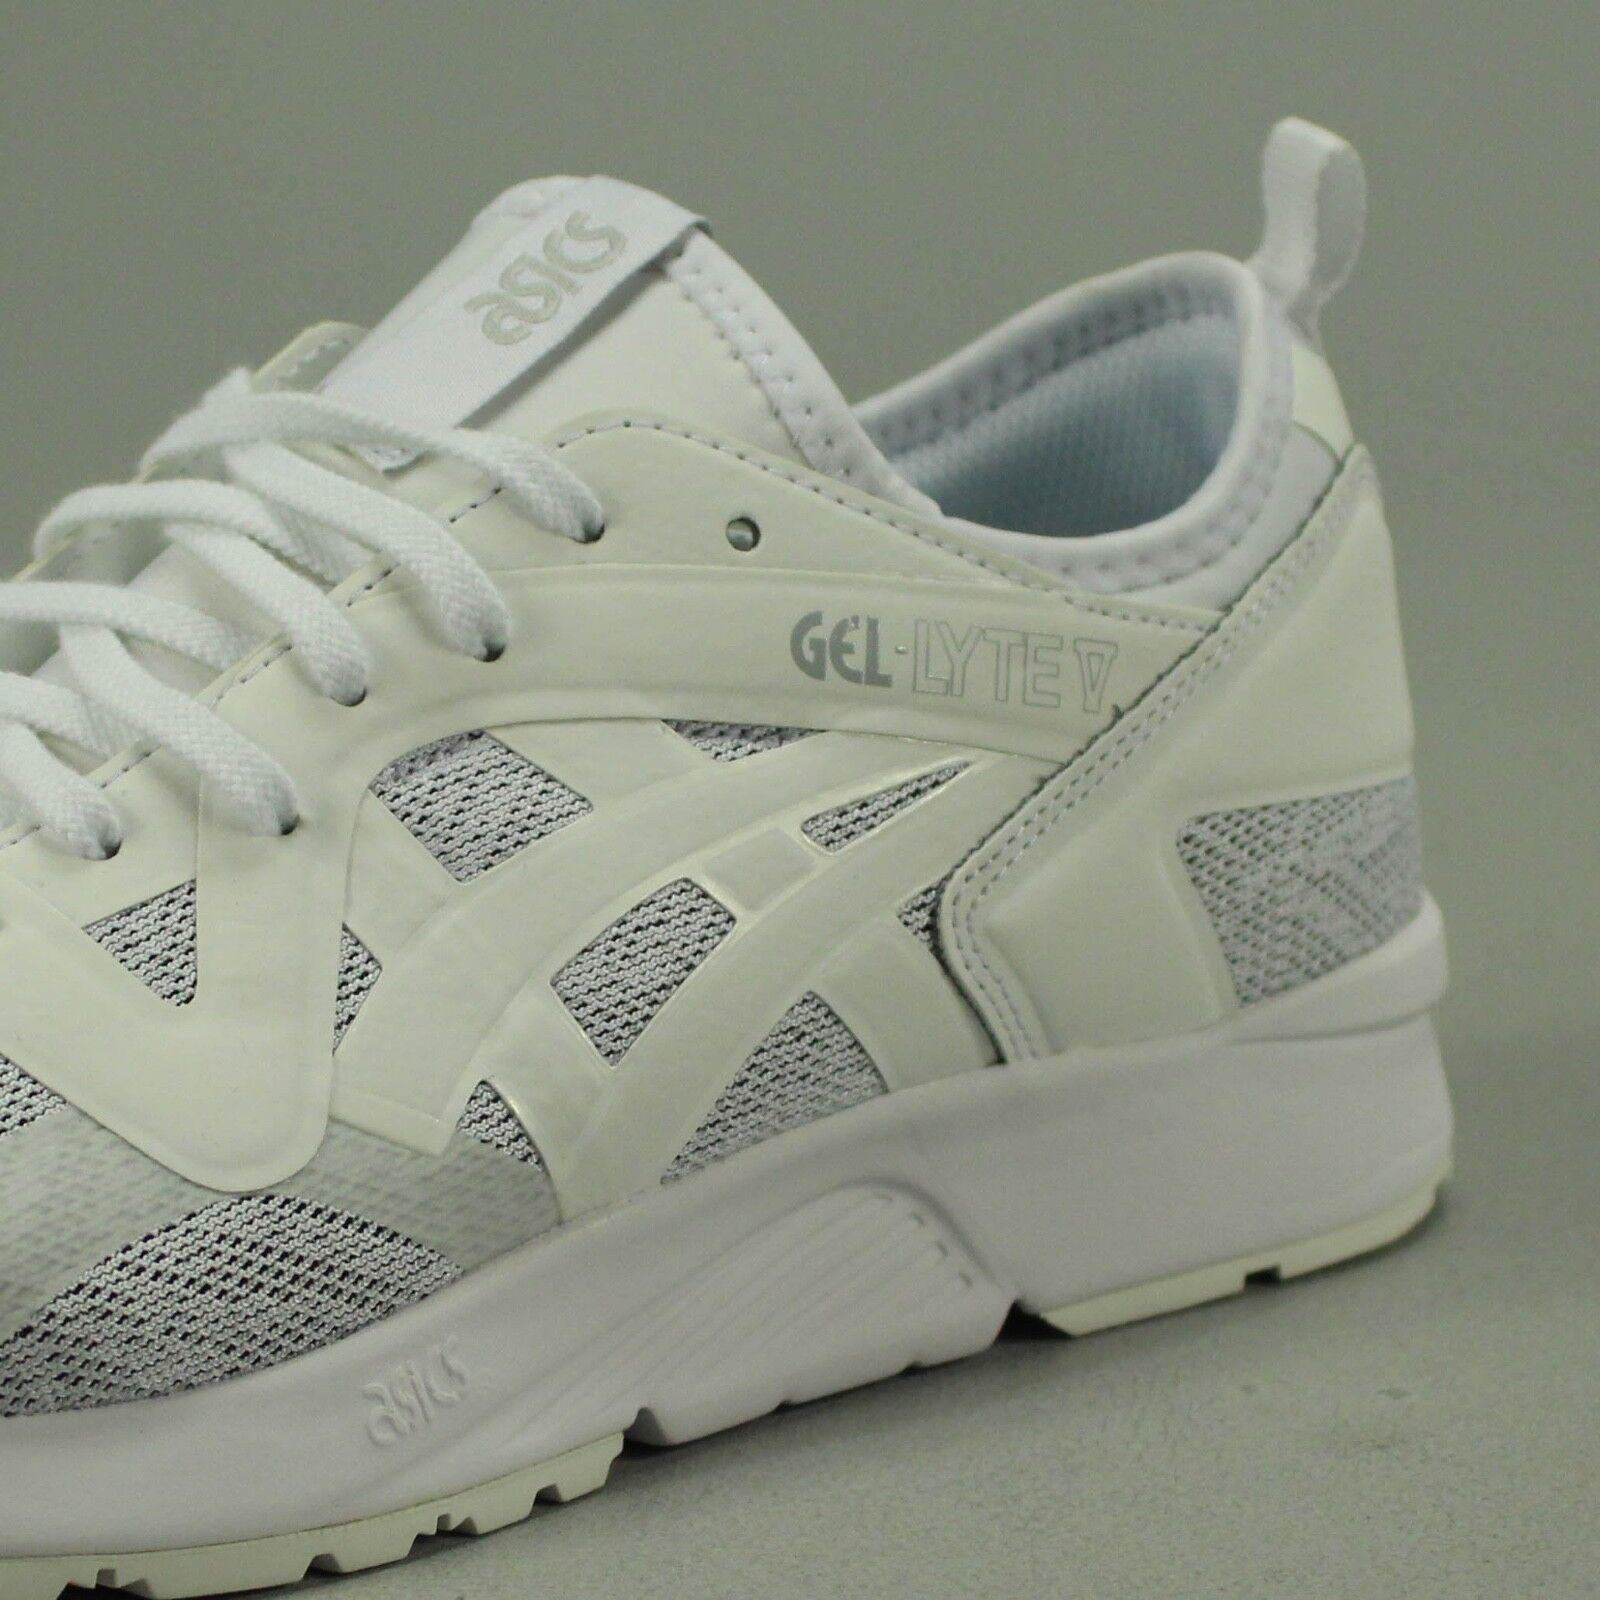 Asics Gel Lyte V NS Schuhes box – Weiß/Weiß New in box Schuhes UK Größe 7,8,9 44f61f